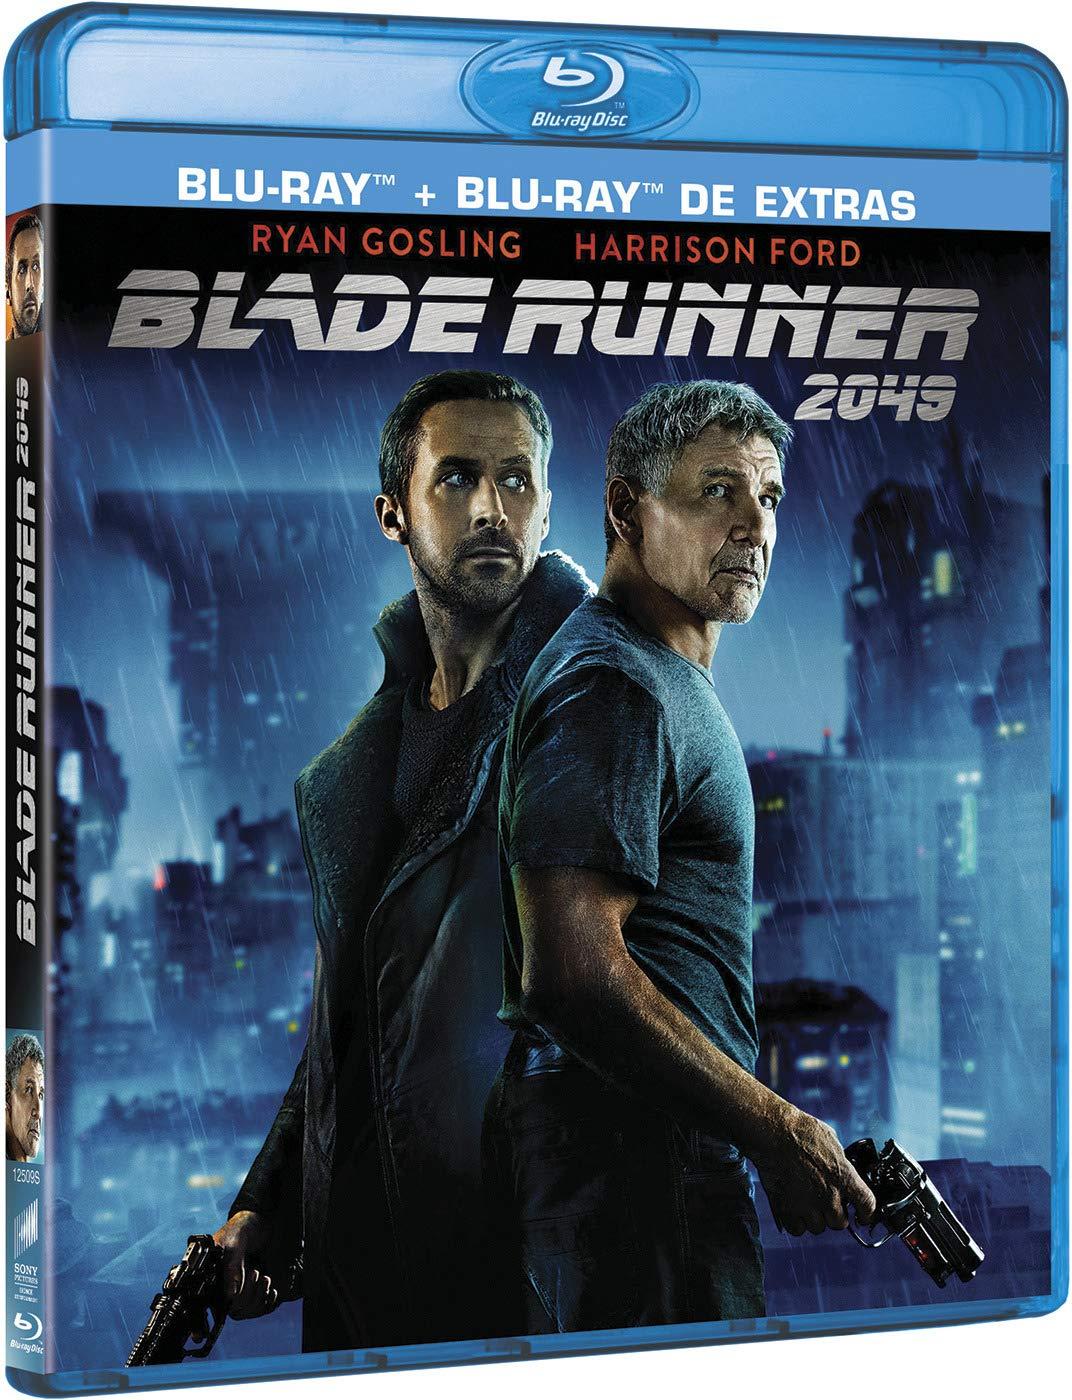 Blade Runner 2049 Blu Ray Blu Ray Extras Amazon De Dvd Blu Ray